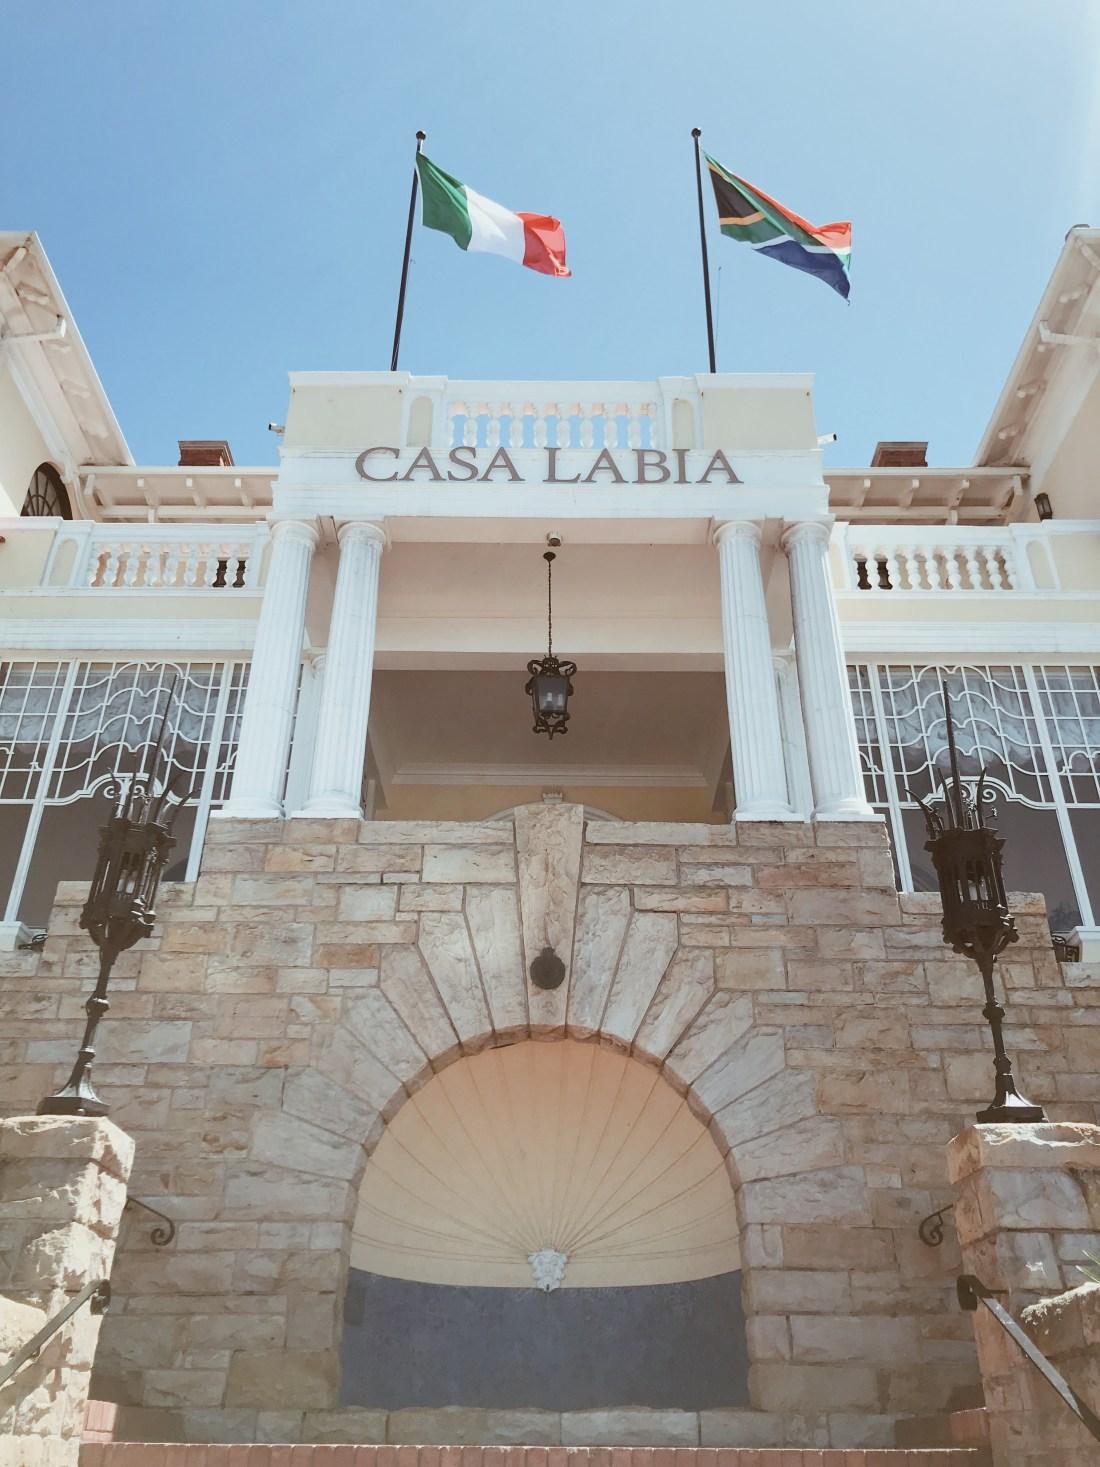 Casa Labia LorindasWorld